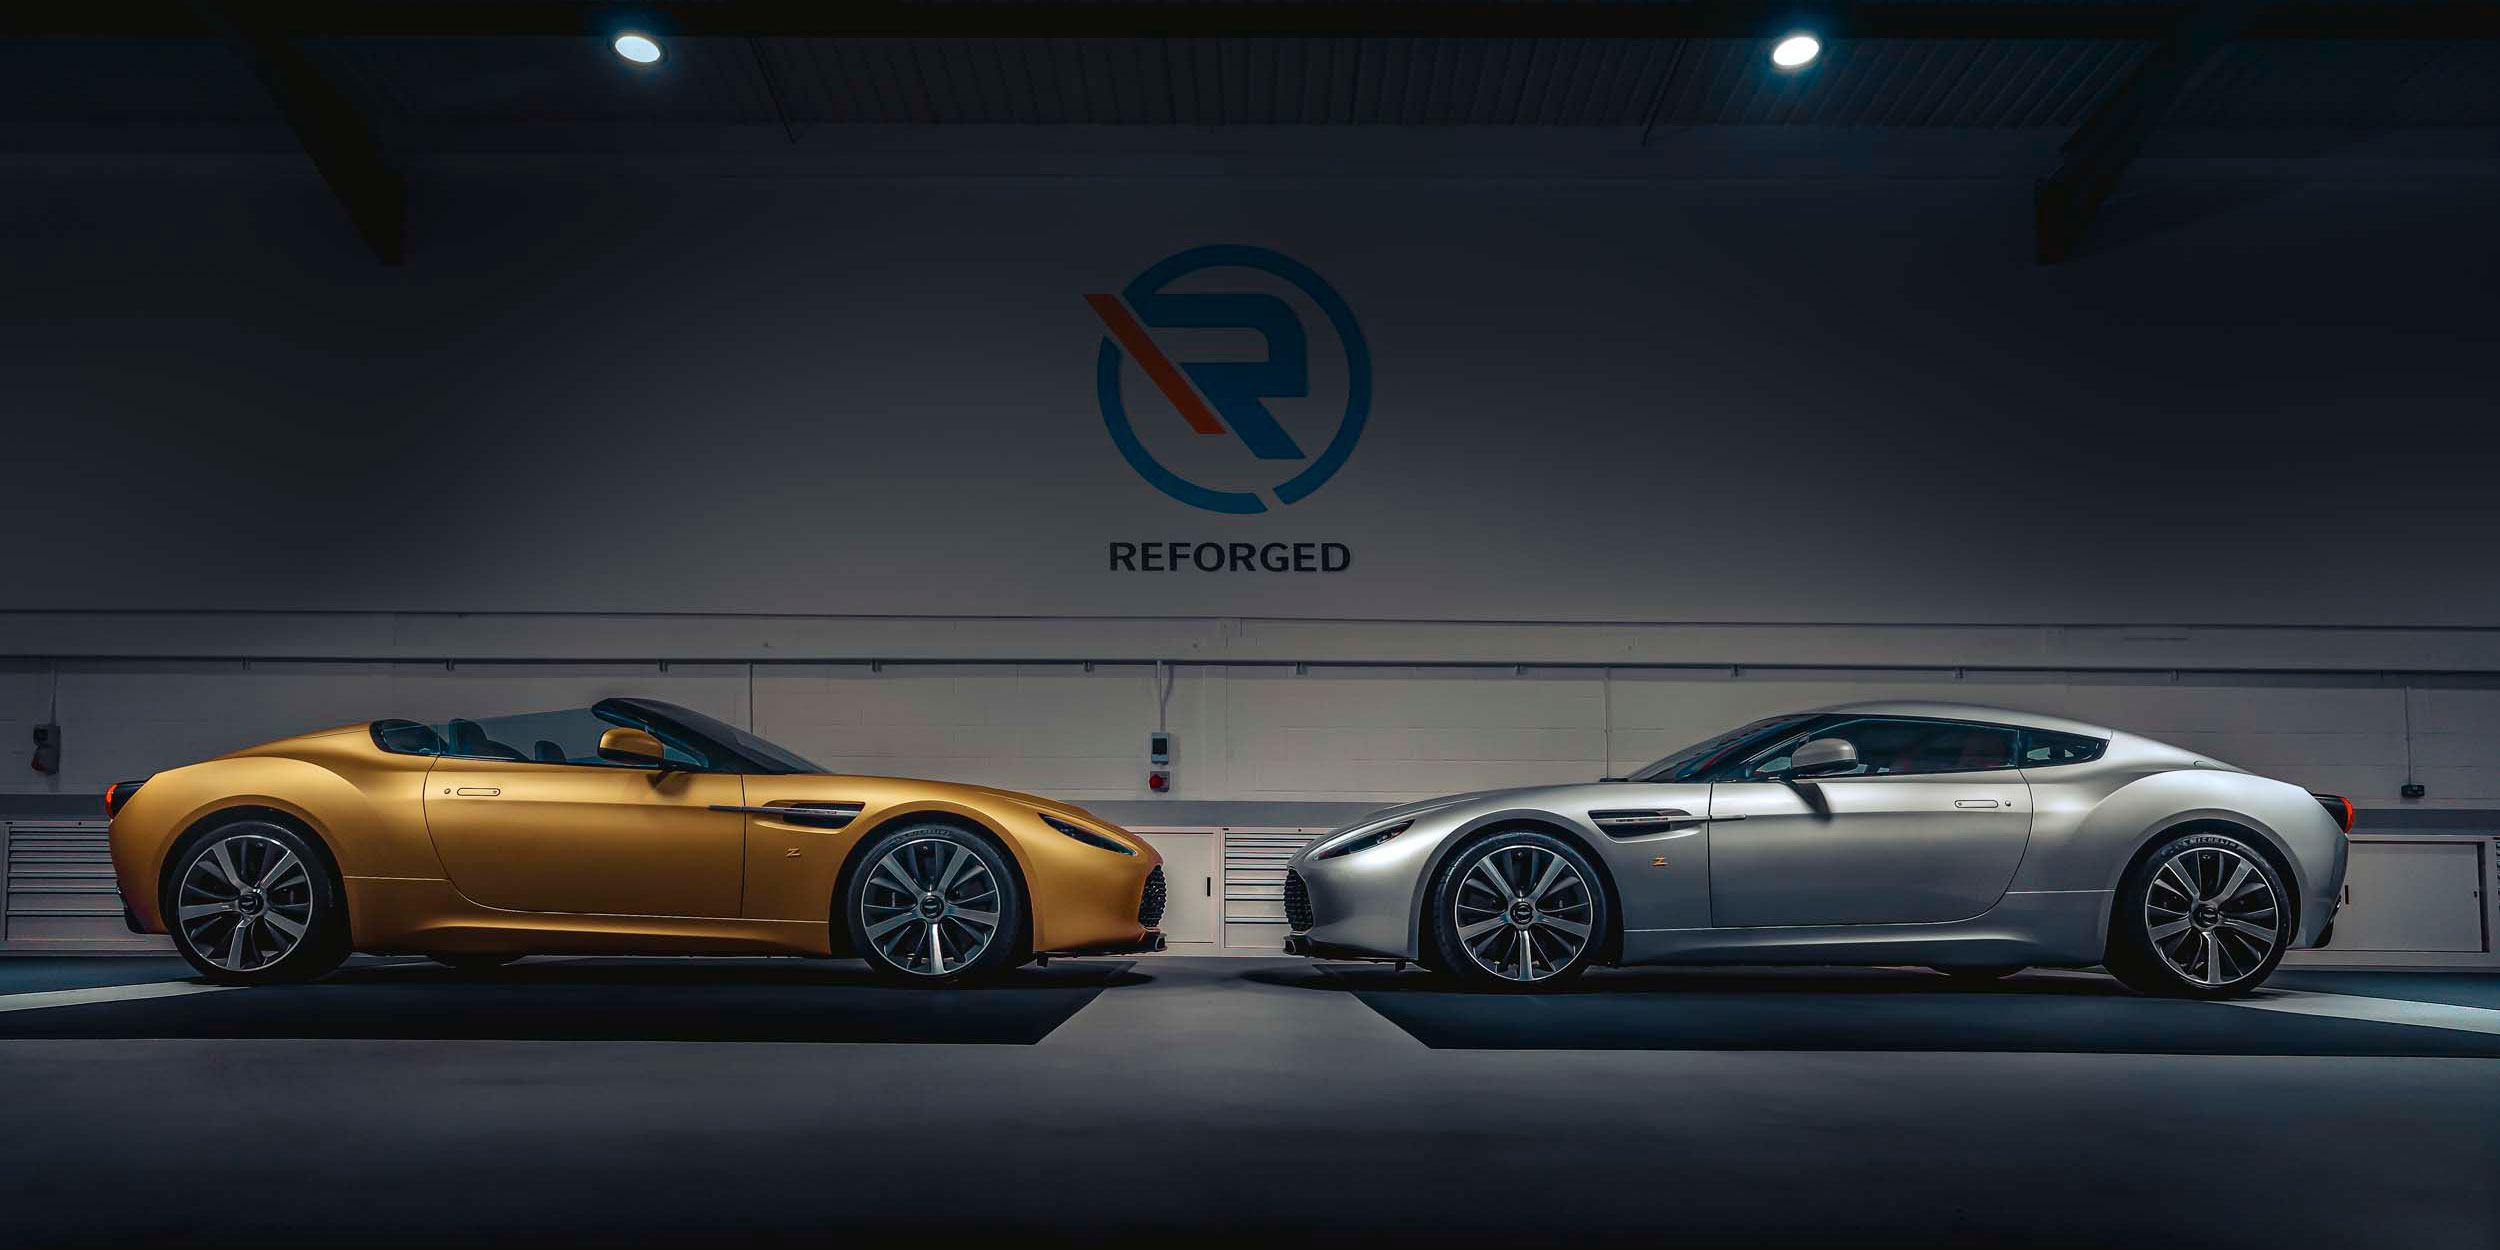 Revealed: Aston Martin Vantage V12 Zagato Heritage TWINS by R-Reforged